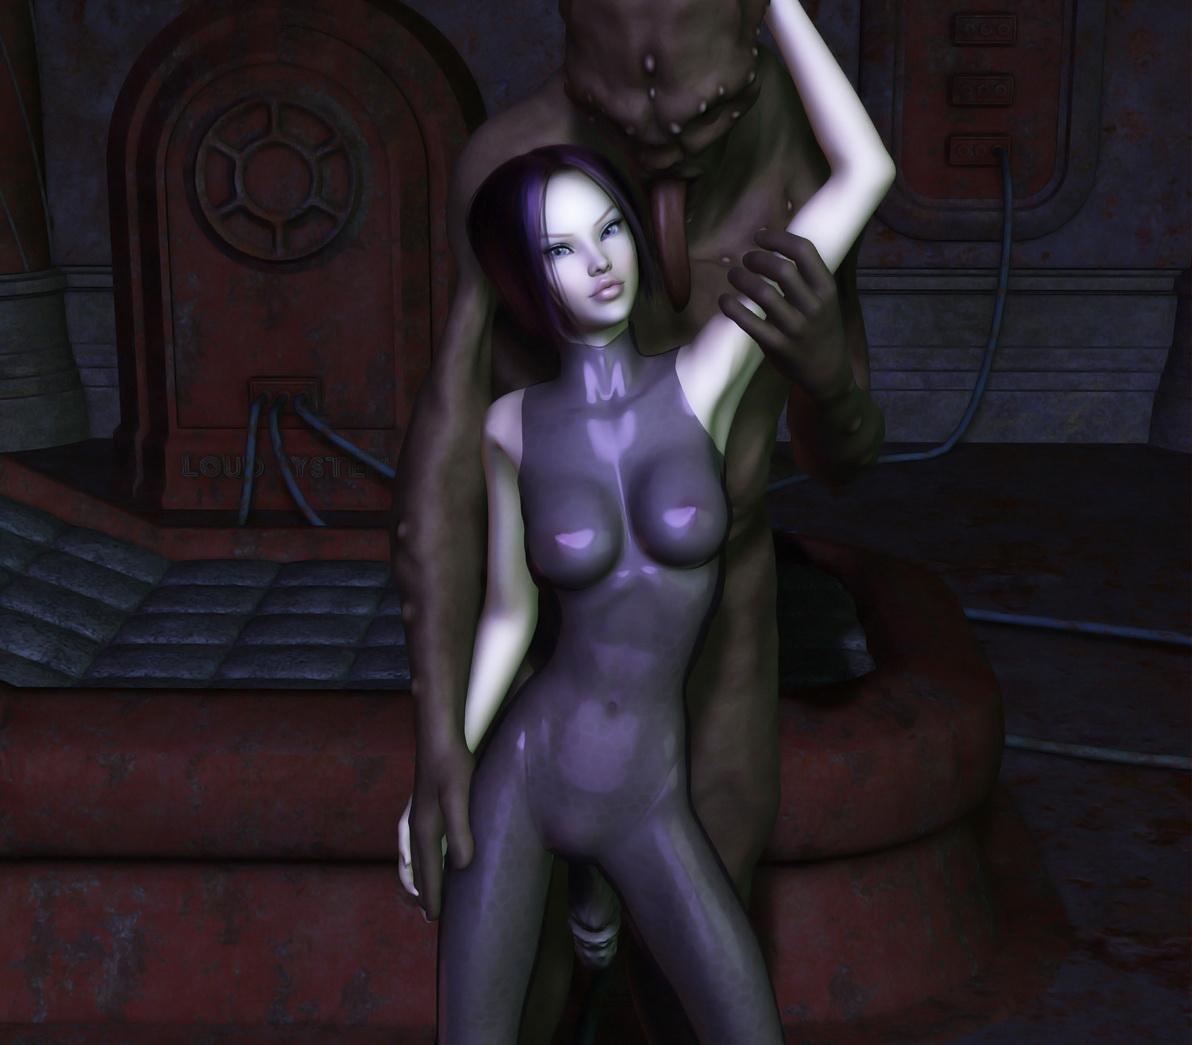 Lady cartoon naked gallery nackt photo